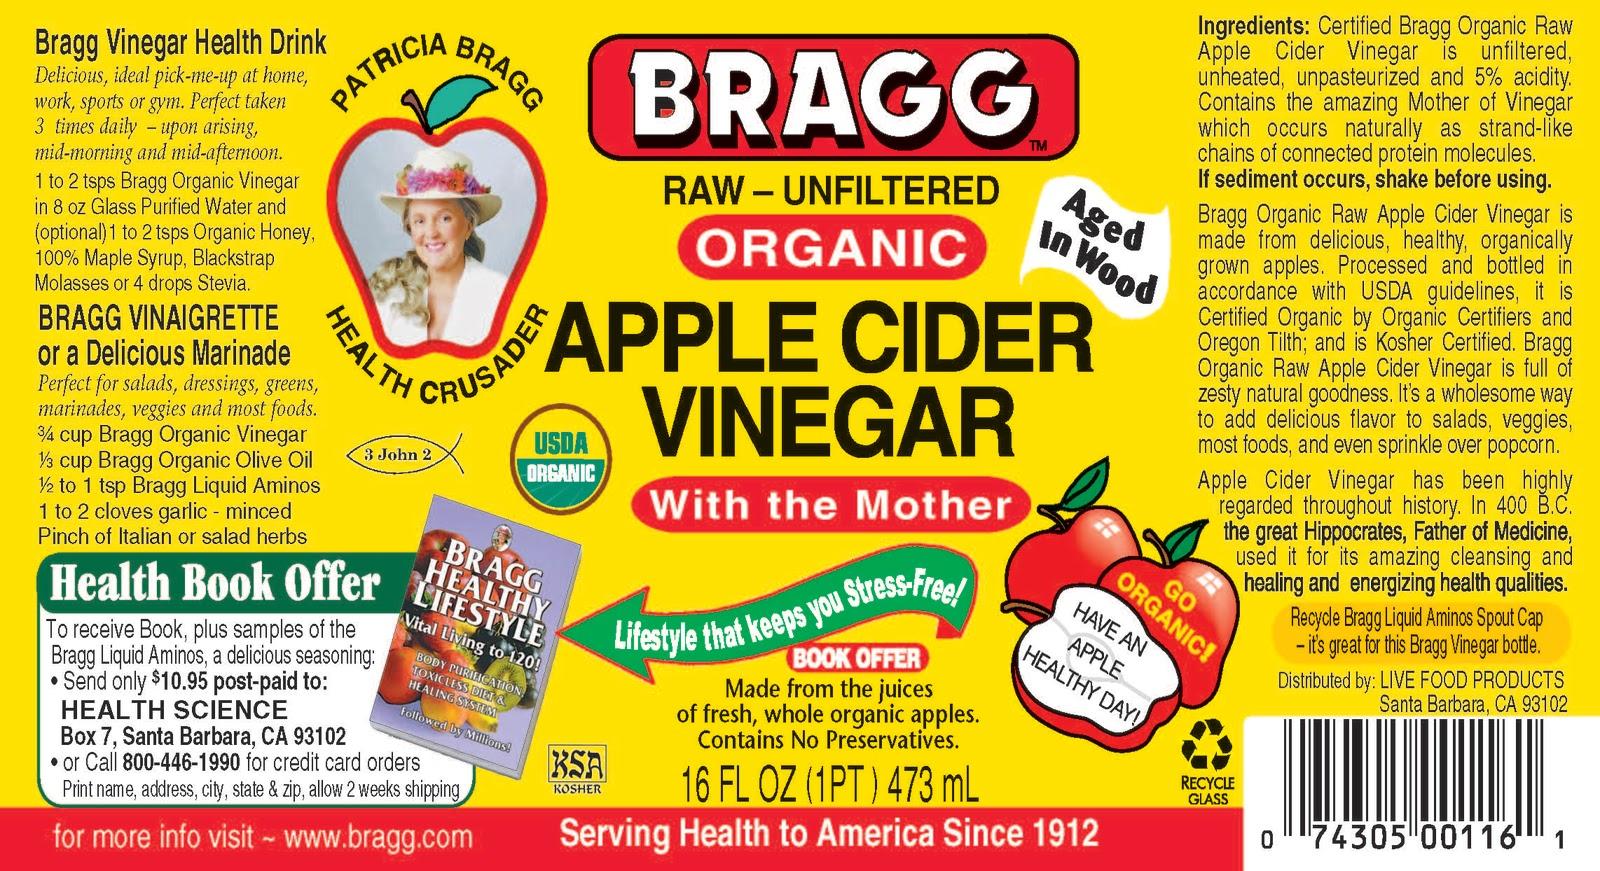 Balance Beauty:: An Apple Cider Vinegar a Day Keeps the